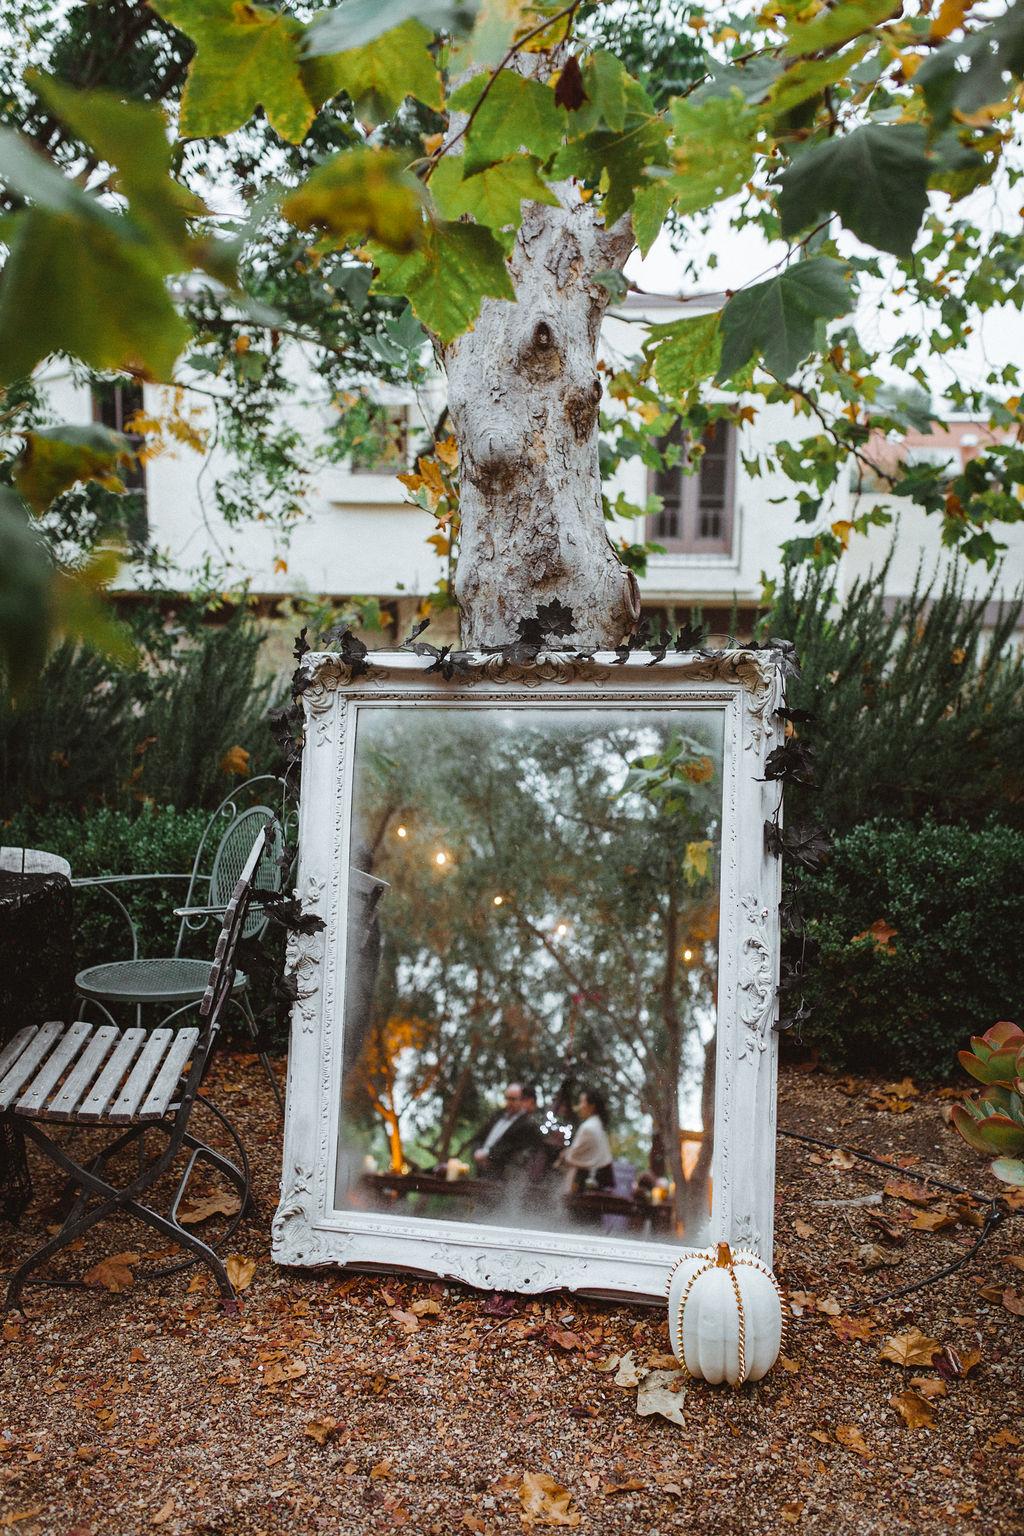 October-Details-Wedding-Pasadena-California-Halloween-Tim-Burton-Alice-Wonderland-Whimsical-Hieusz-Photography-30.jpg